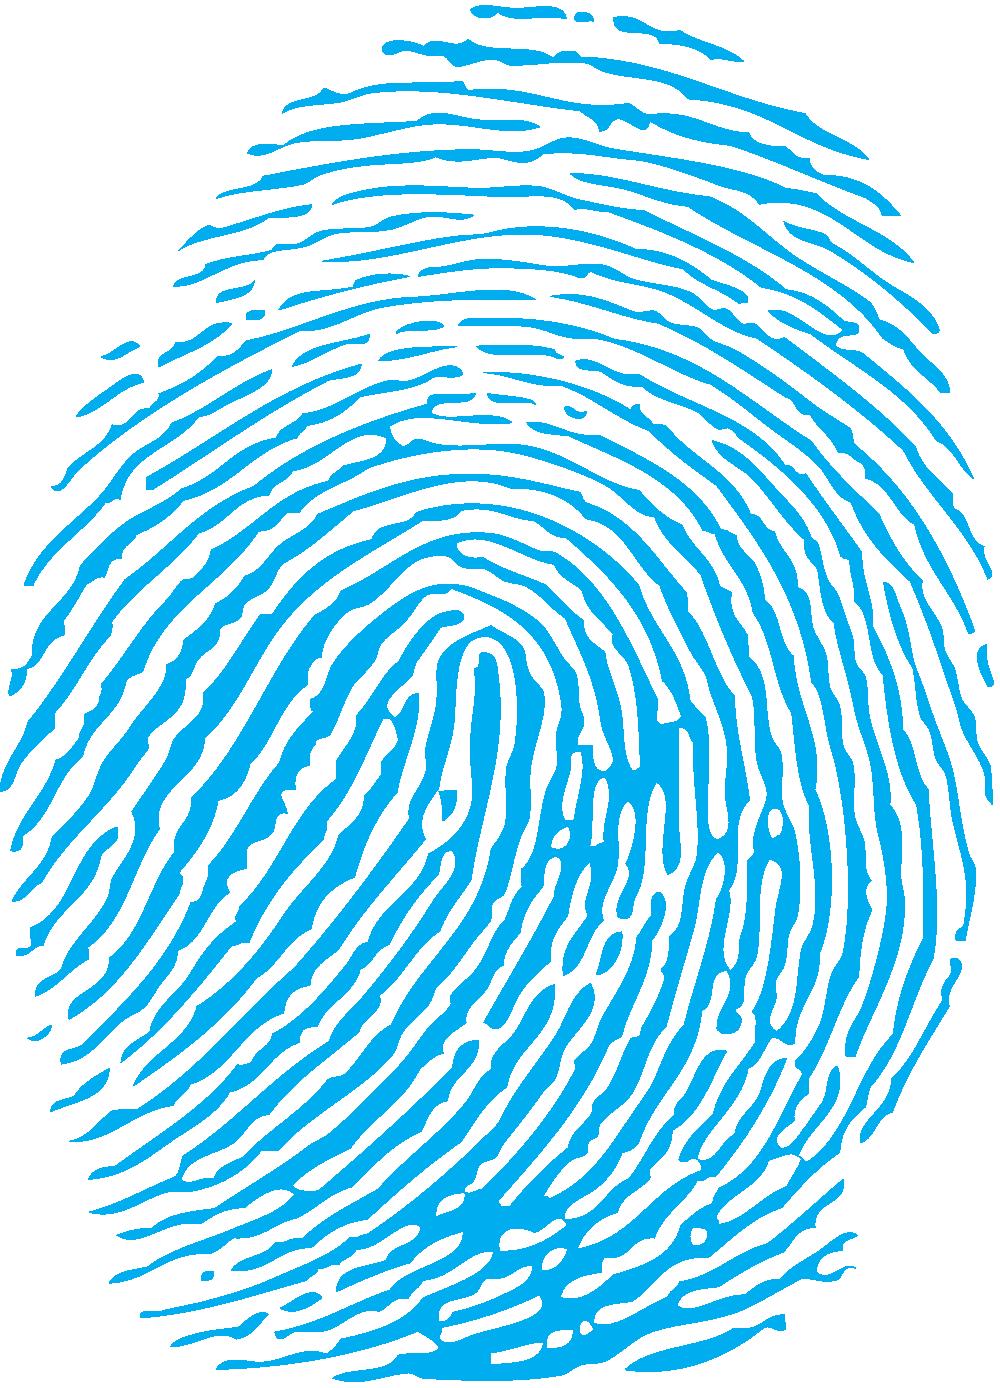 Basketball fingerprint clipart black and white fingerprint png - Google Search   Yearbook   Pinterest black and white